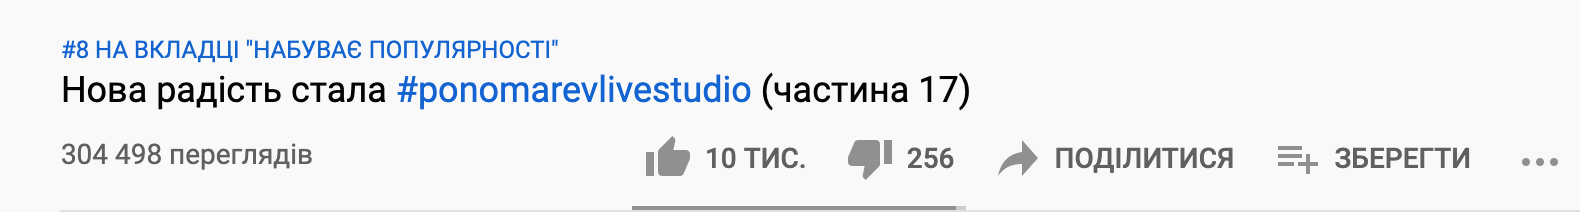 "Колядка ""Нова радість стала"" заняла 8 место в трендах YouTube"